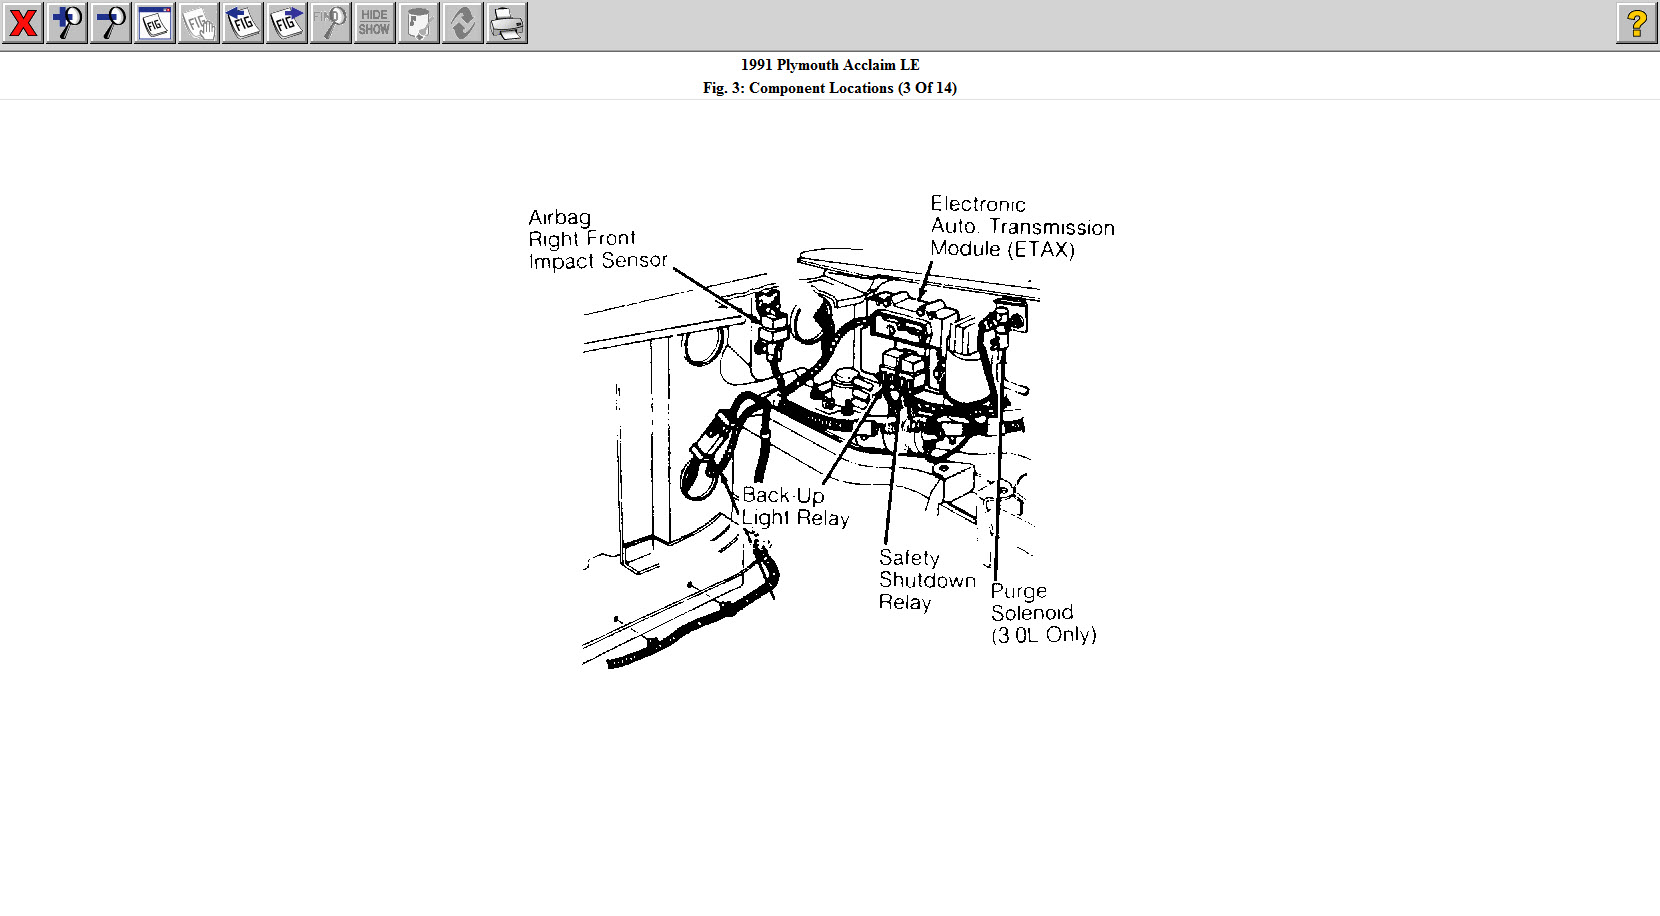 Plymouth Acclaim Engine Diagram